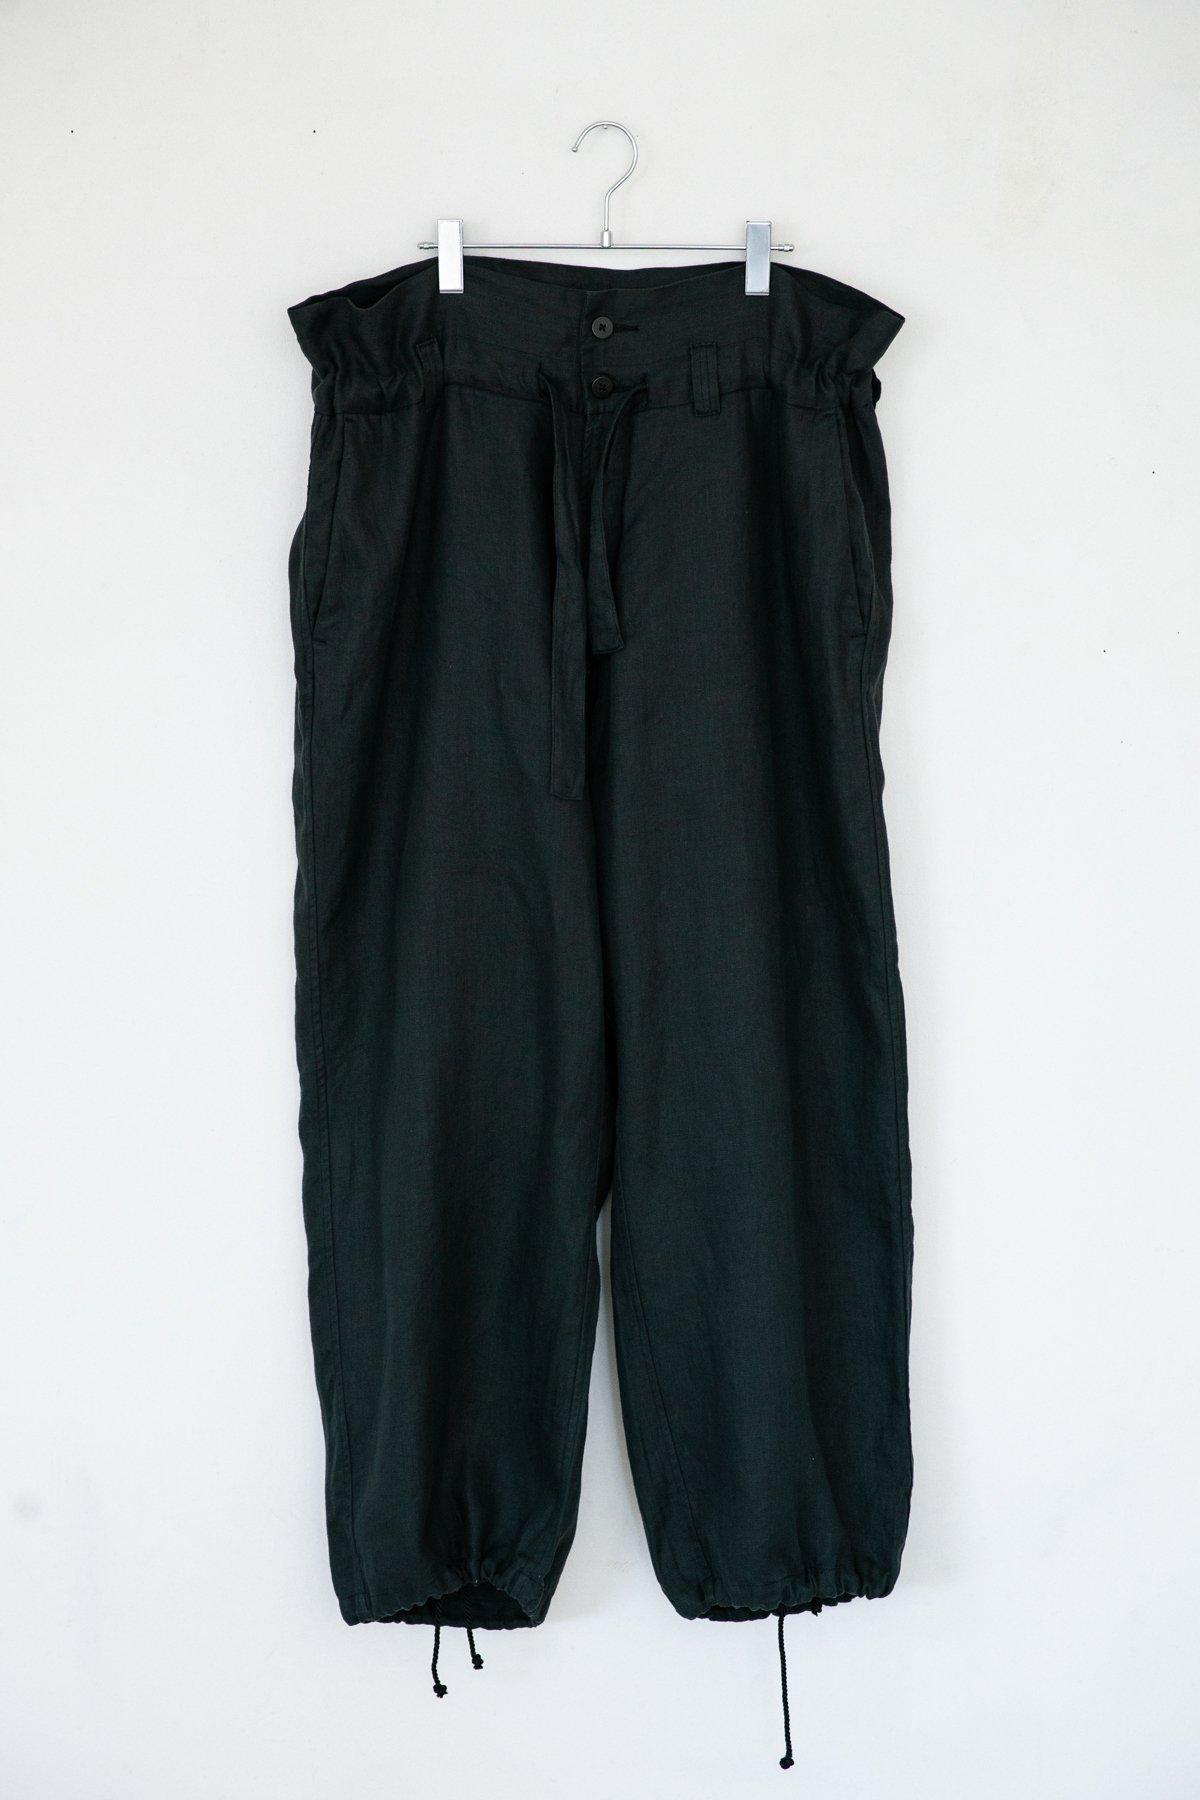 whowhat / HIGHT-WAIST PANTS GREEN BLACK